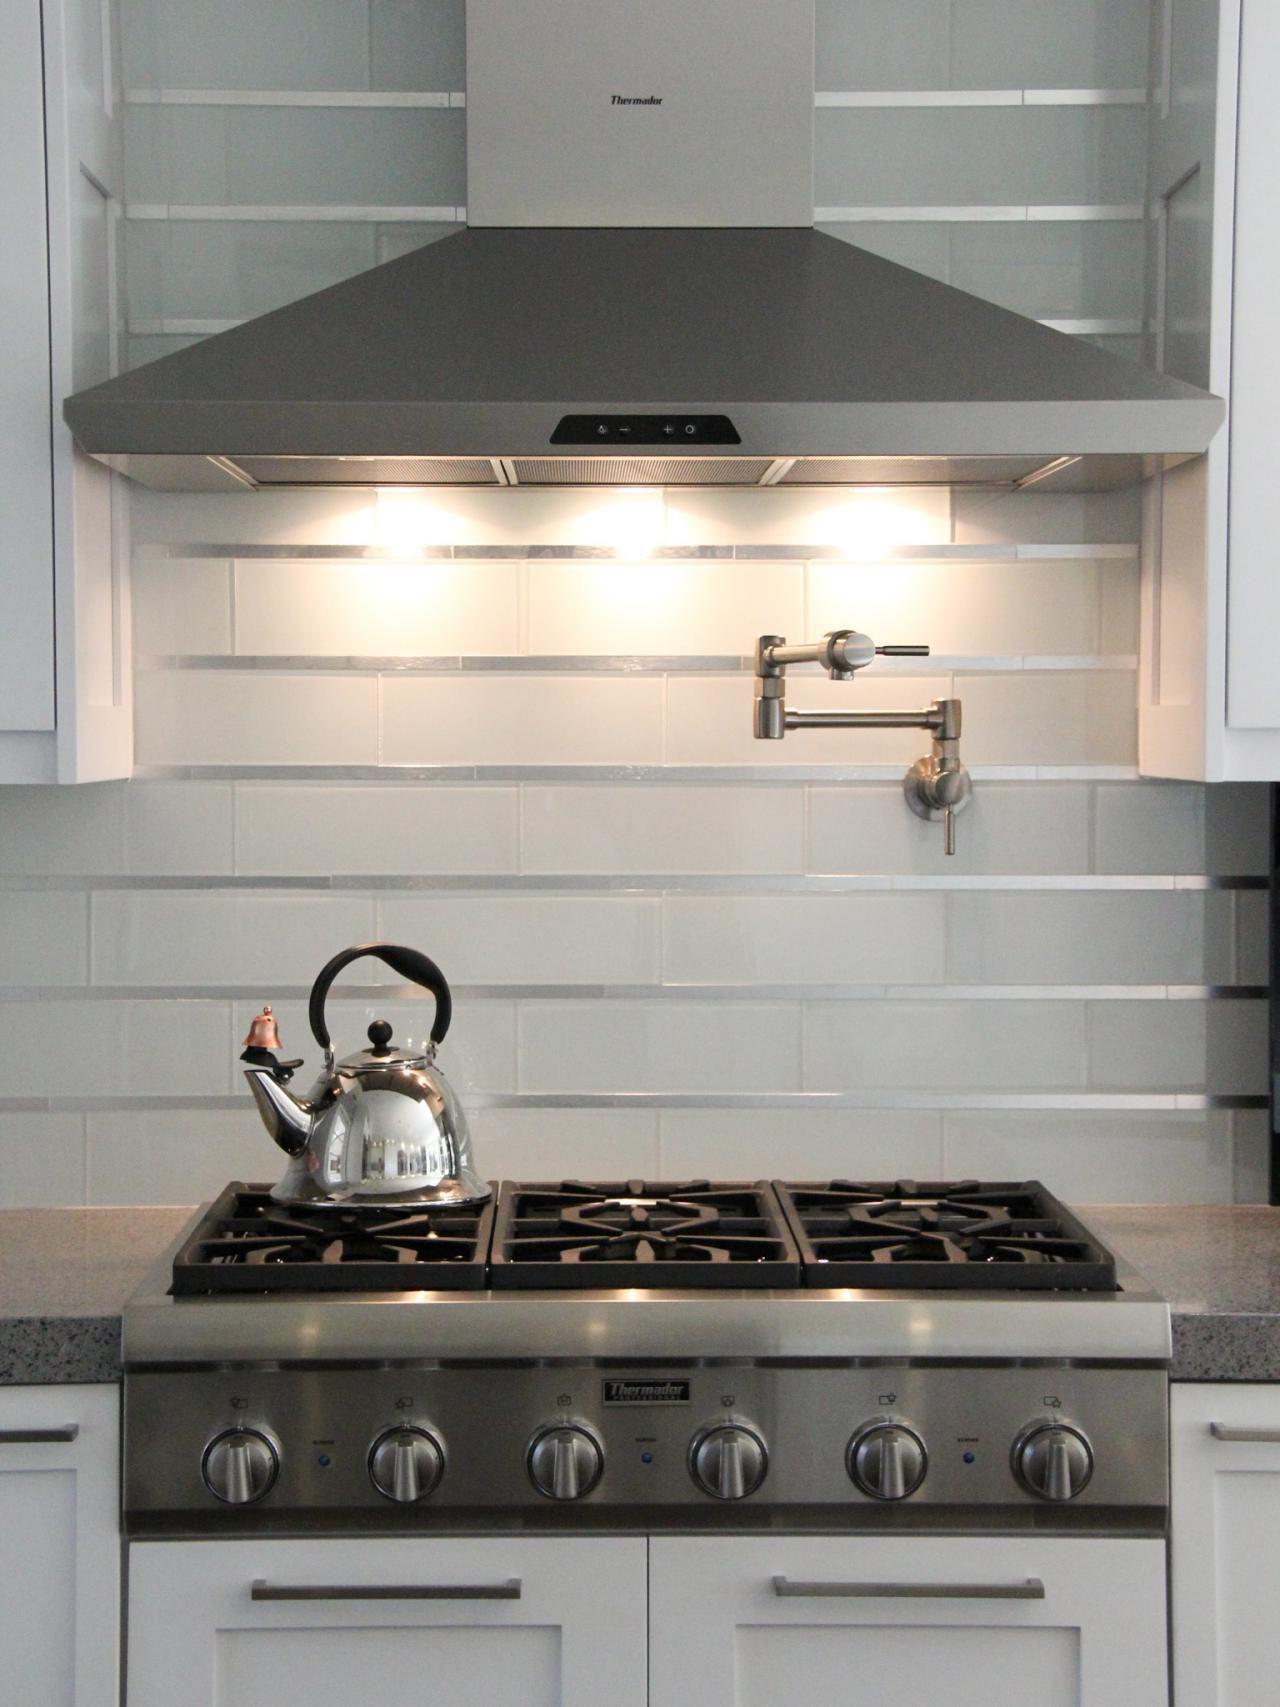 New Kitchen Tile Backsplash Design Ideas